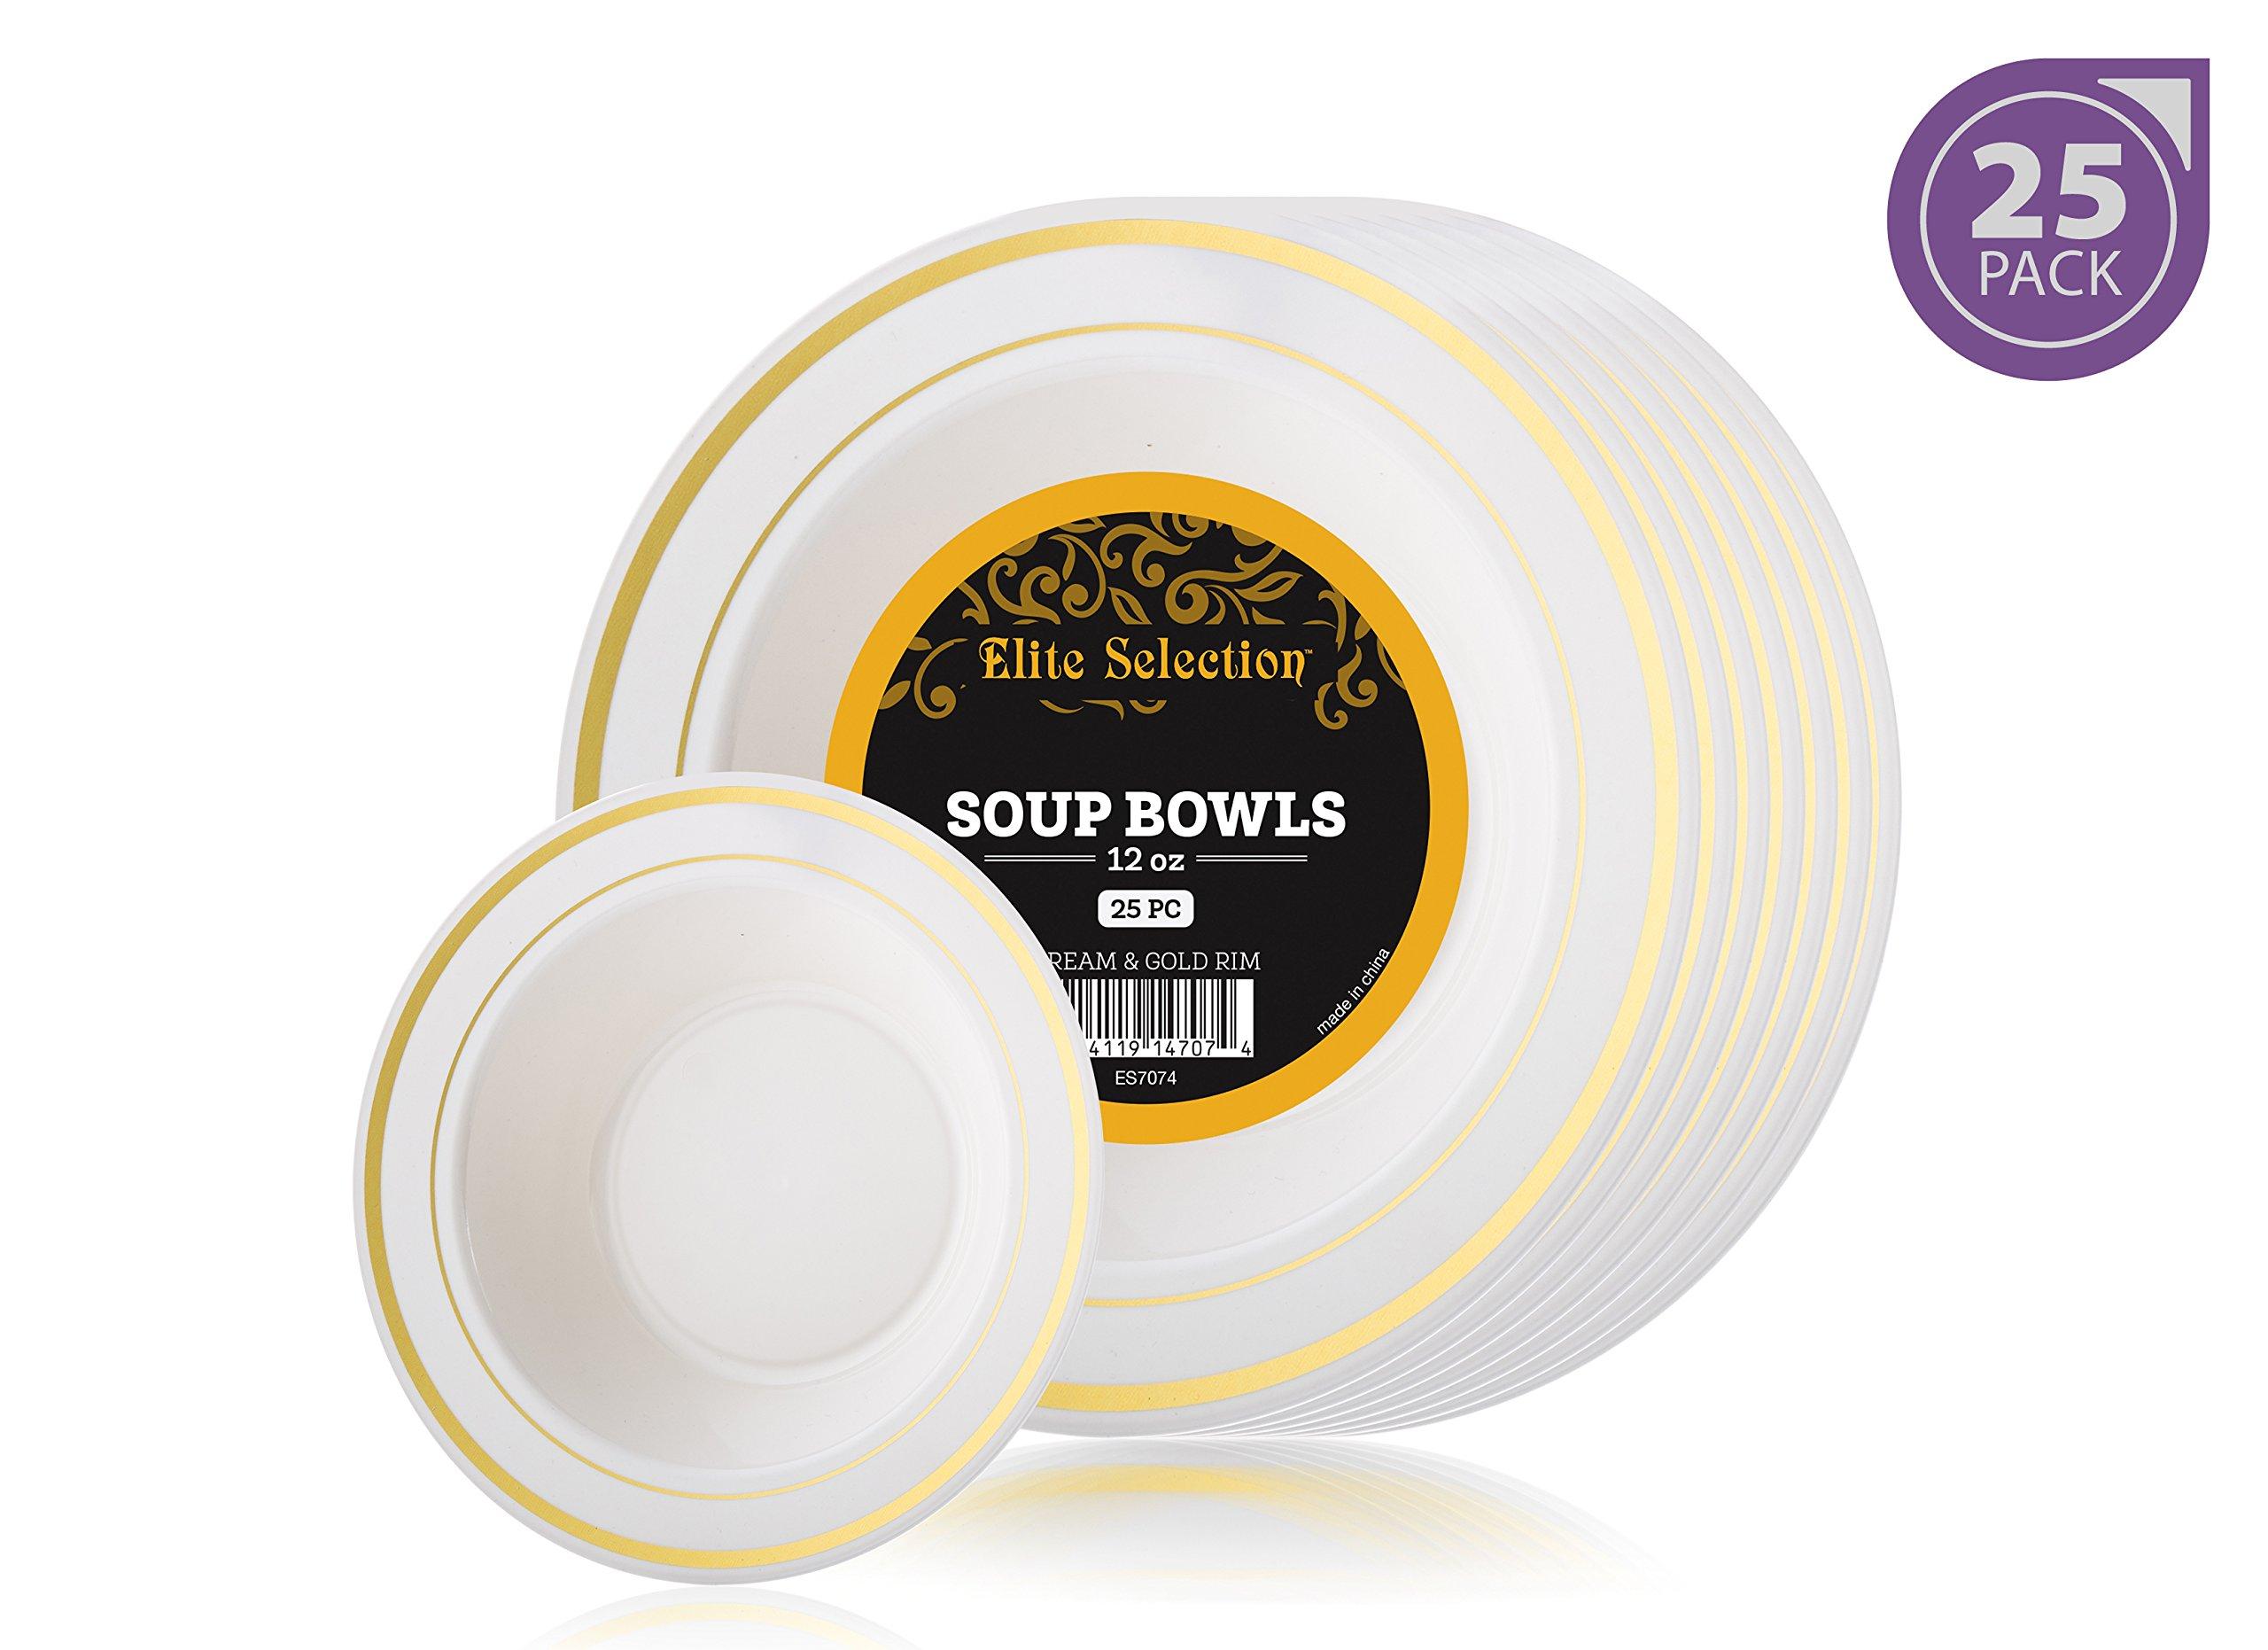 Elite Selection Soup Plates – 25 Party Plastic Disposable Bowls – 12 oz. White Party Plates with Gold Rim – Soup Plastic Bowls – Party and Restaurant Accessories